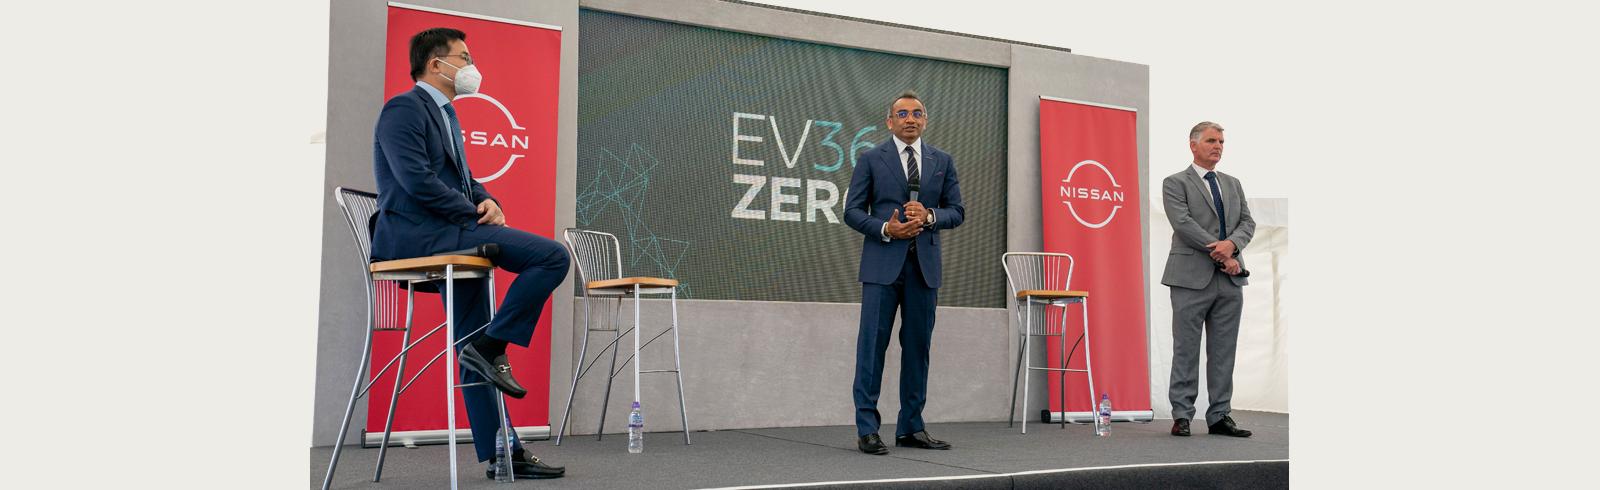 Nissan EV36Zero - an EV hub set in Sunderland, UK